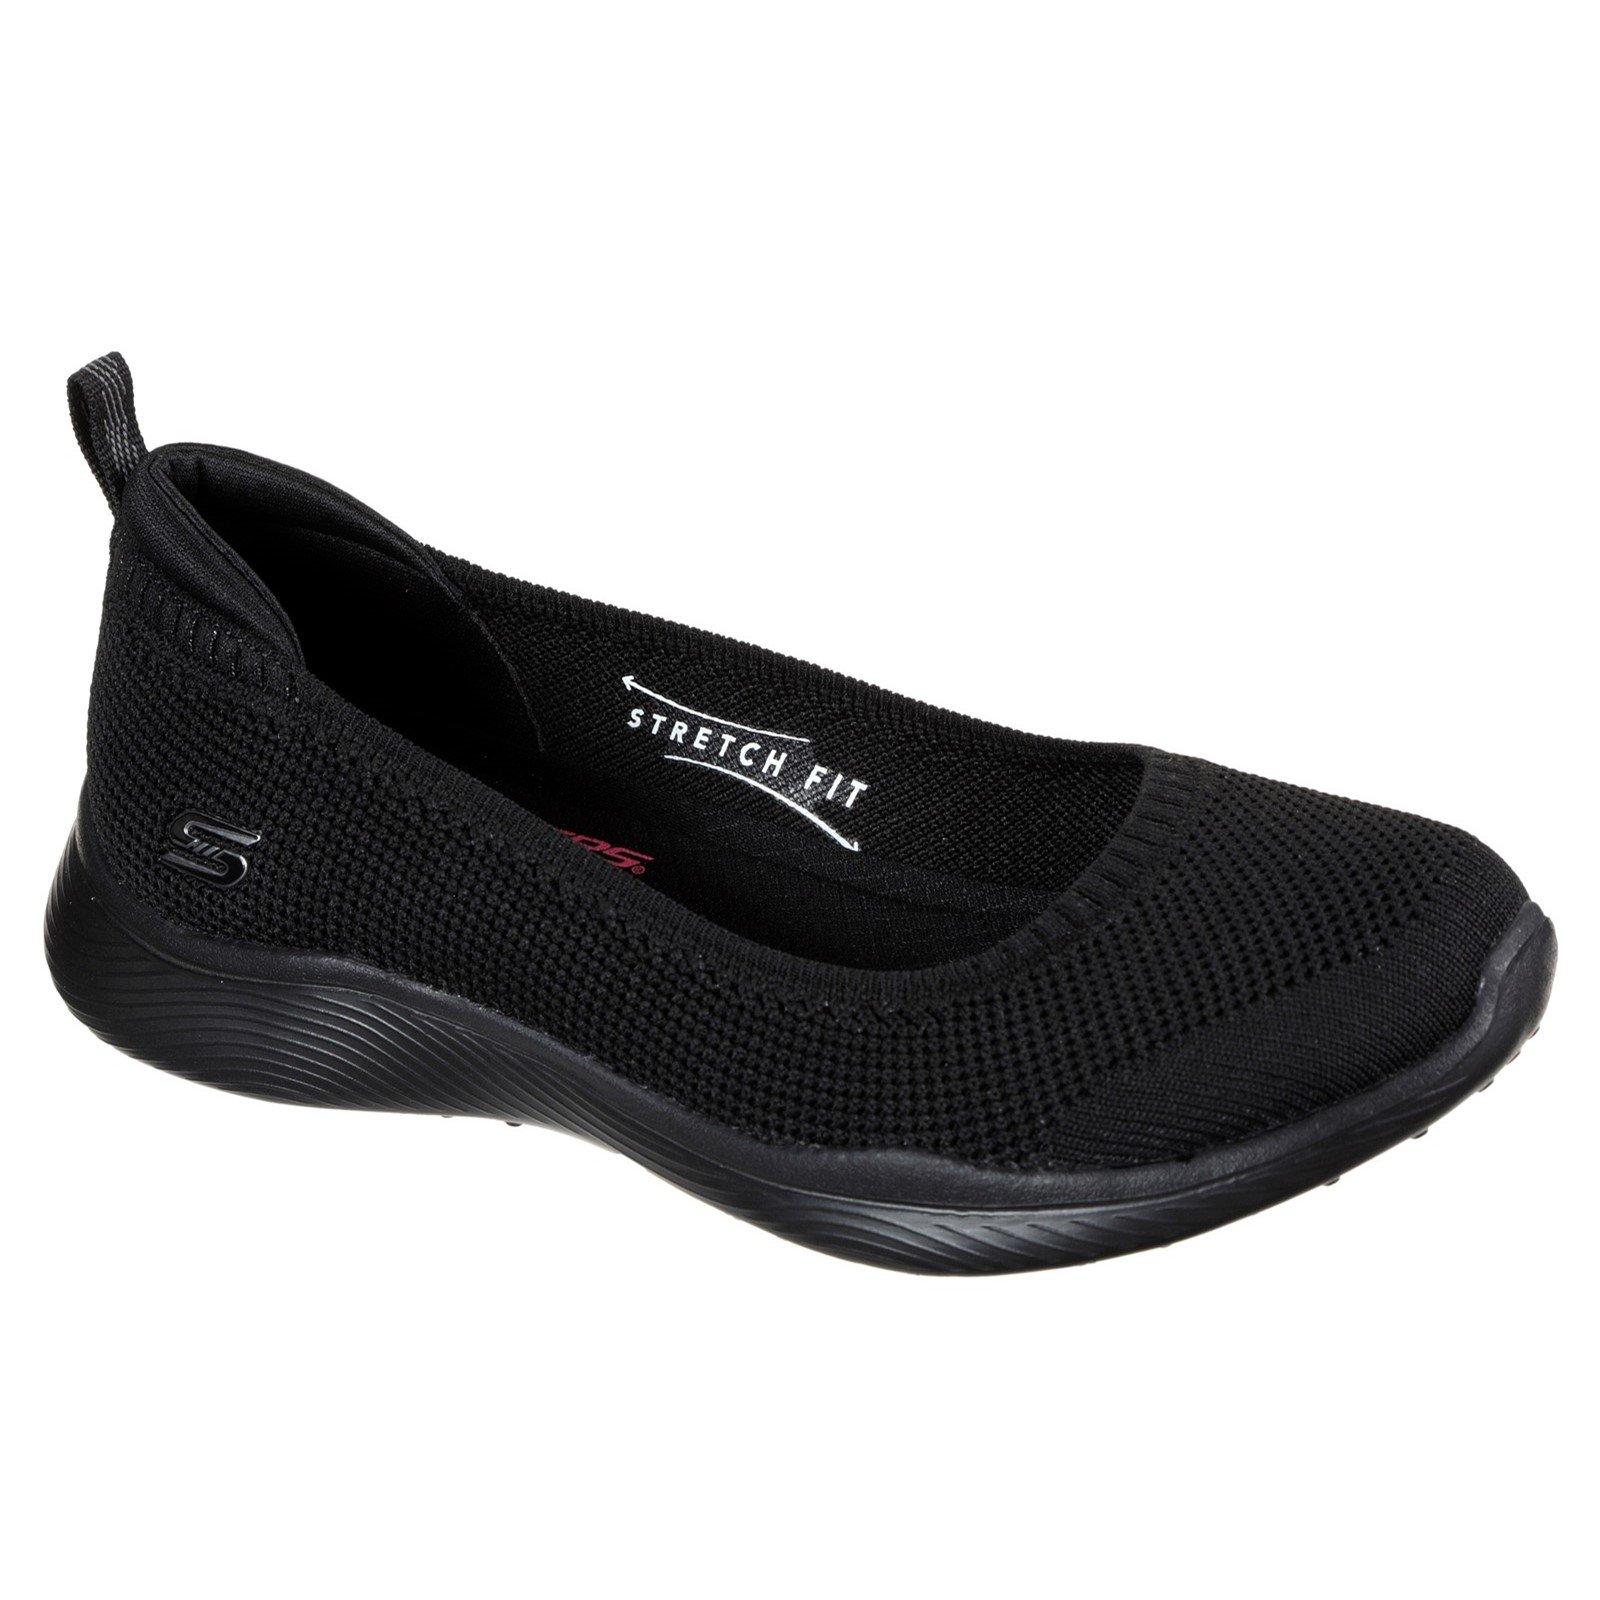 Skechers Women's Microburst 2.0 Be Iconic Wide Trainer Black 33069 - Black 5